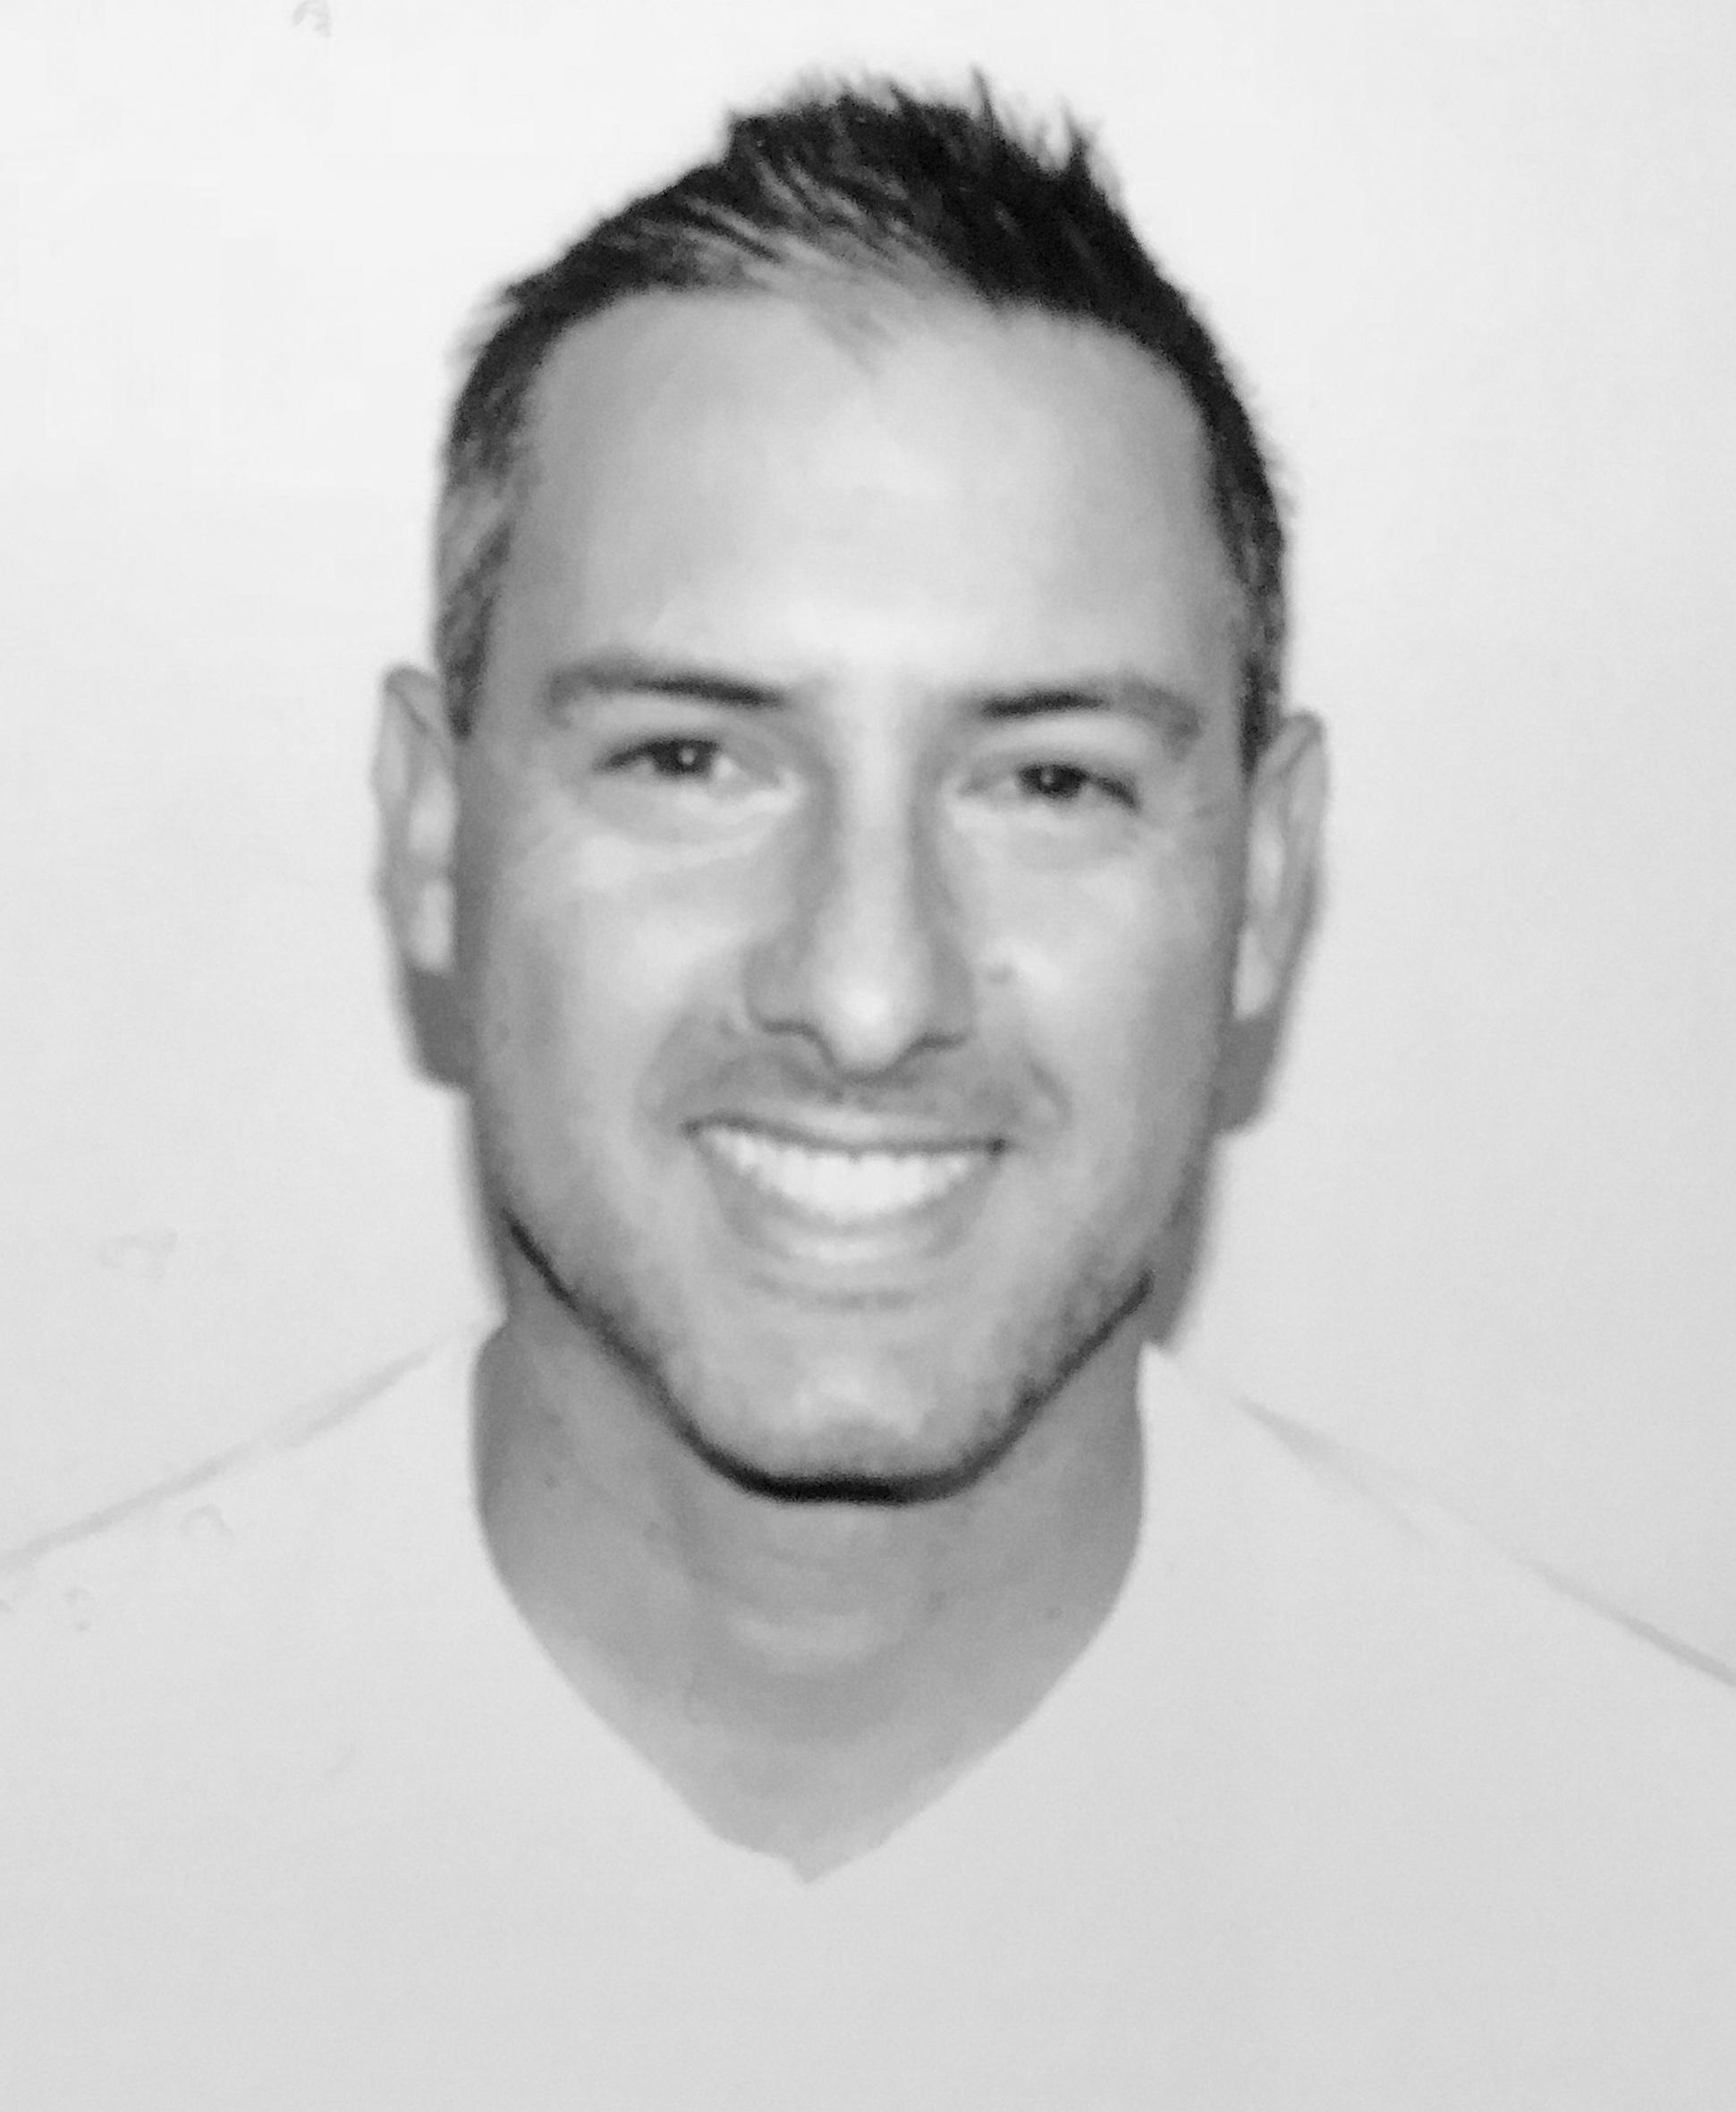 juanbarbieri's avatar